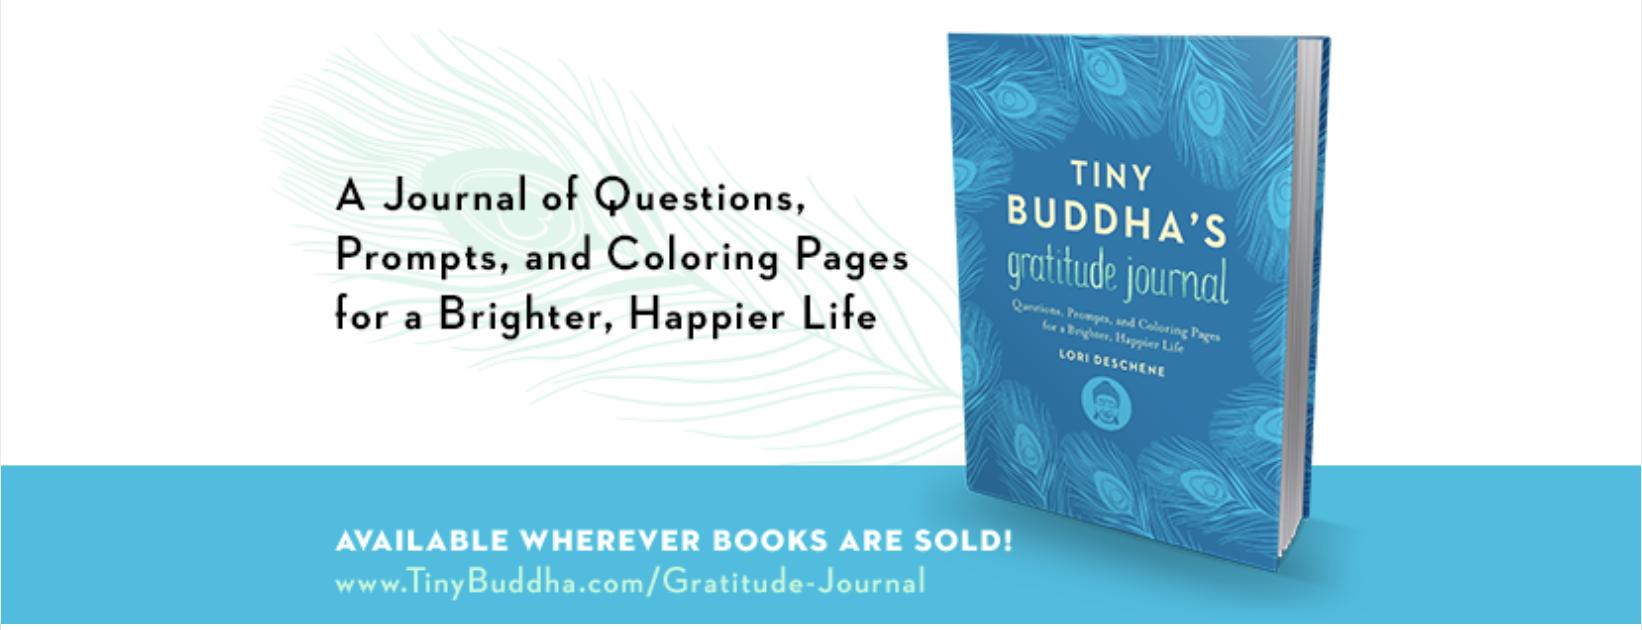 Tiny Buddha Facebook Page Image